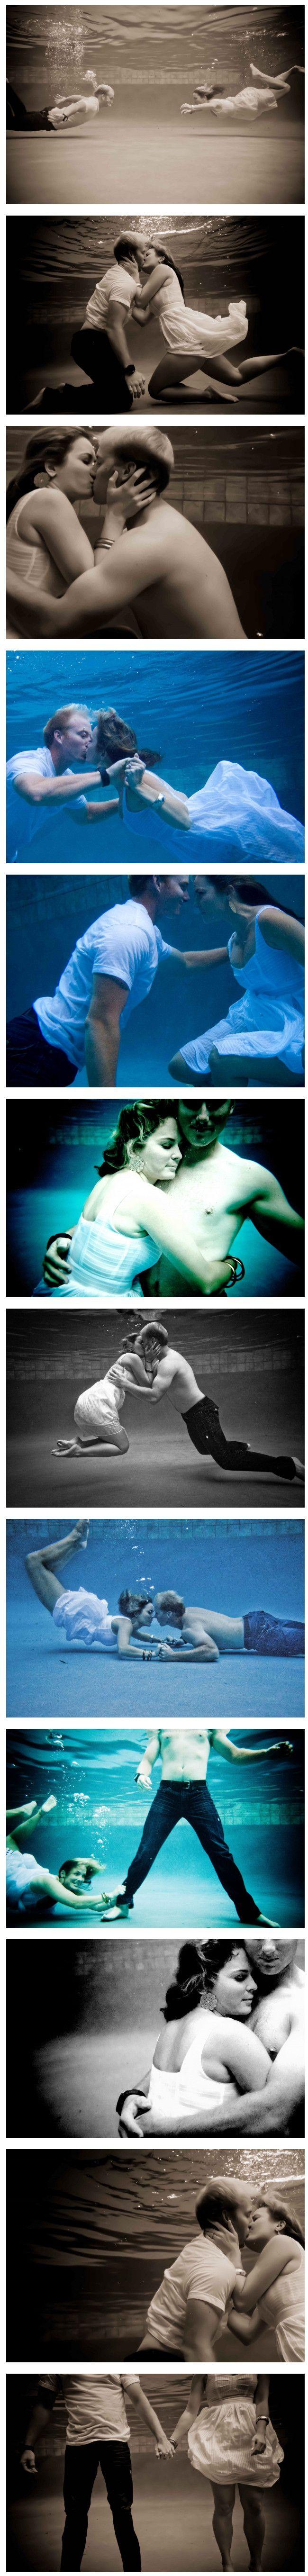 Under water engagement pictures | Brandon & Erica Photography | brandonerica.com